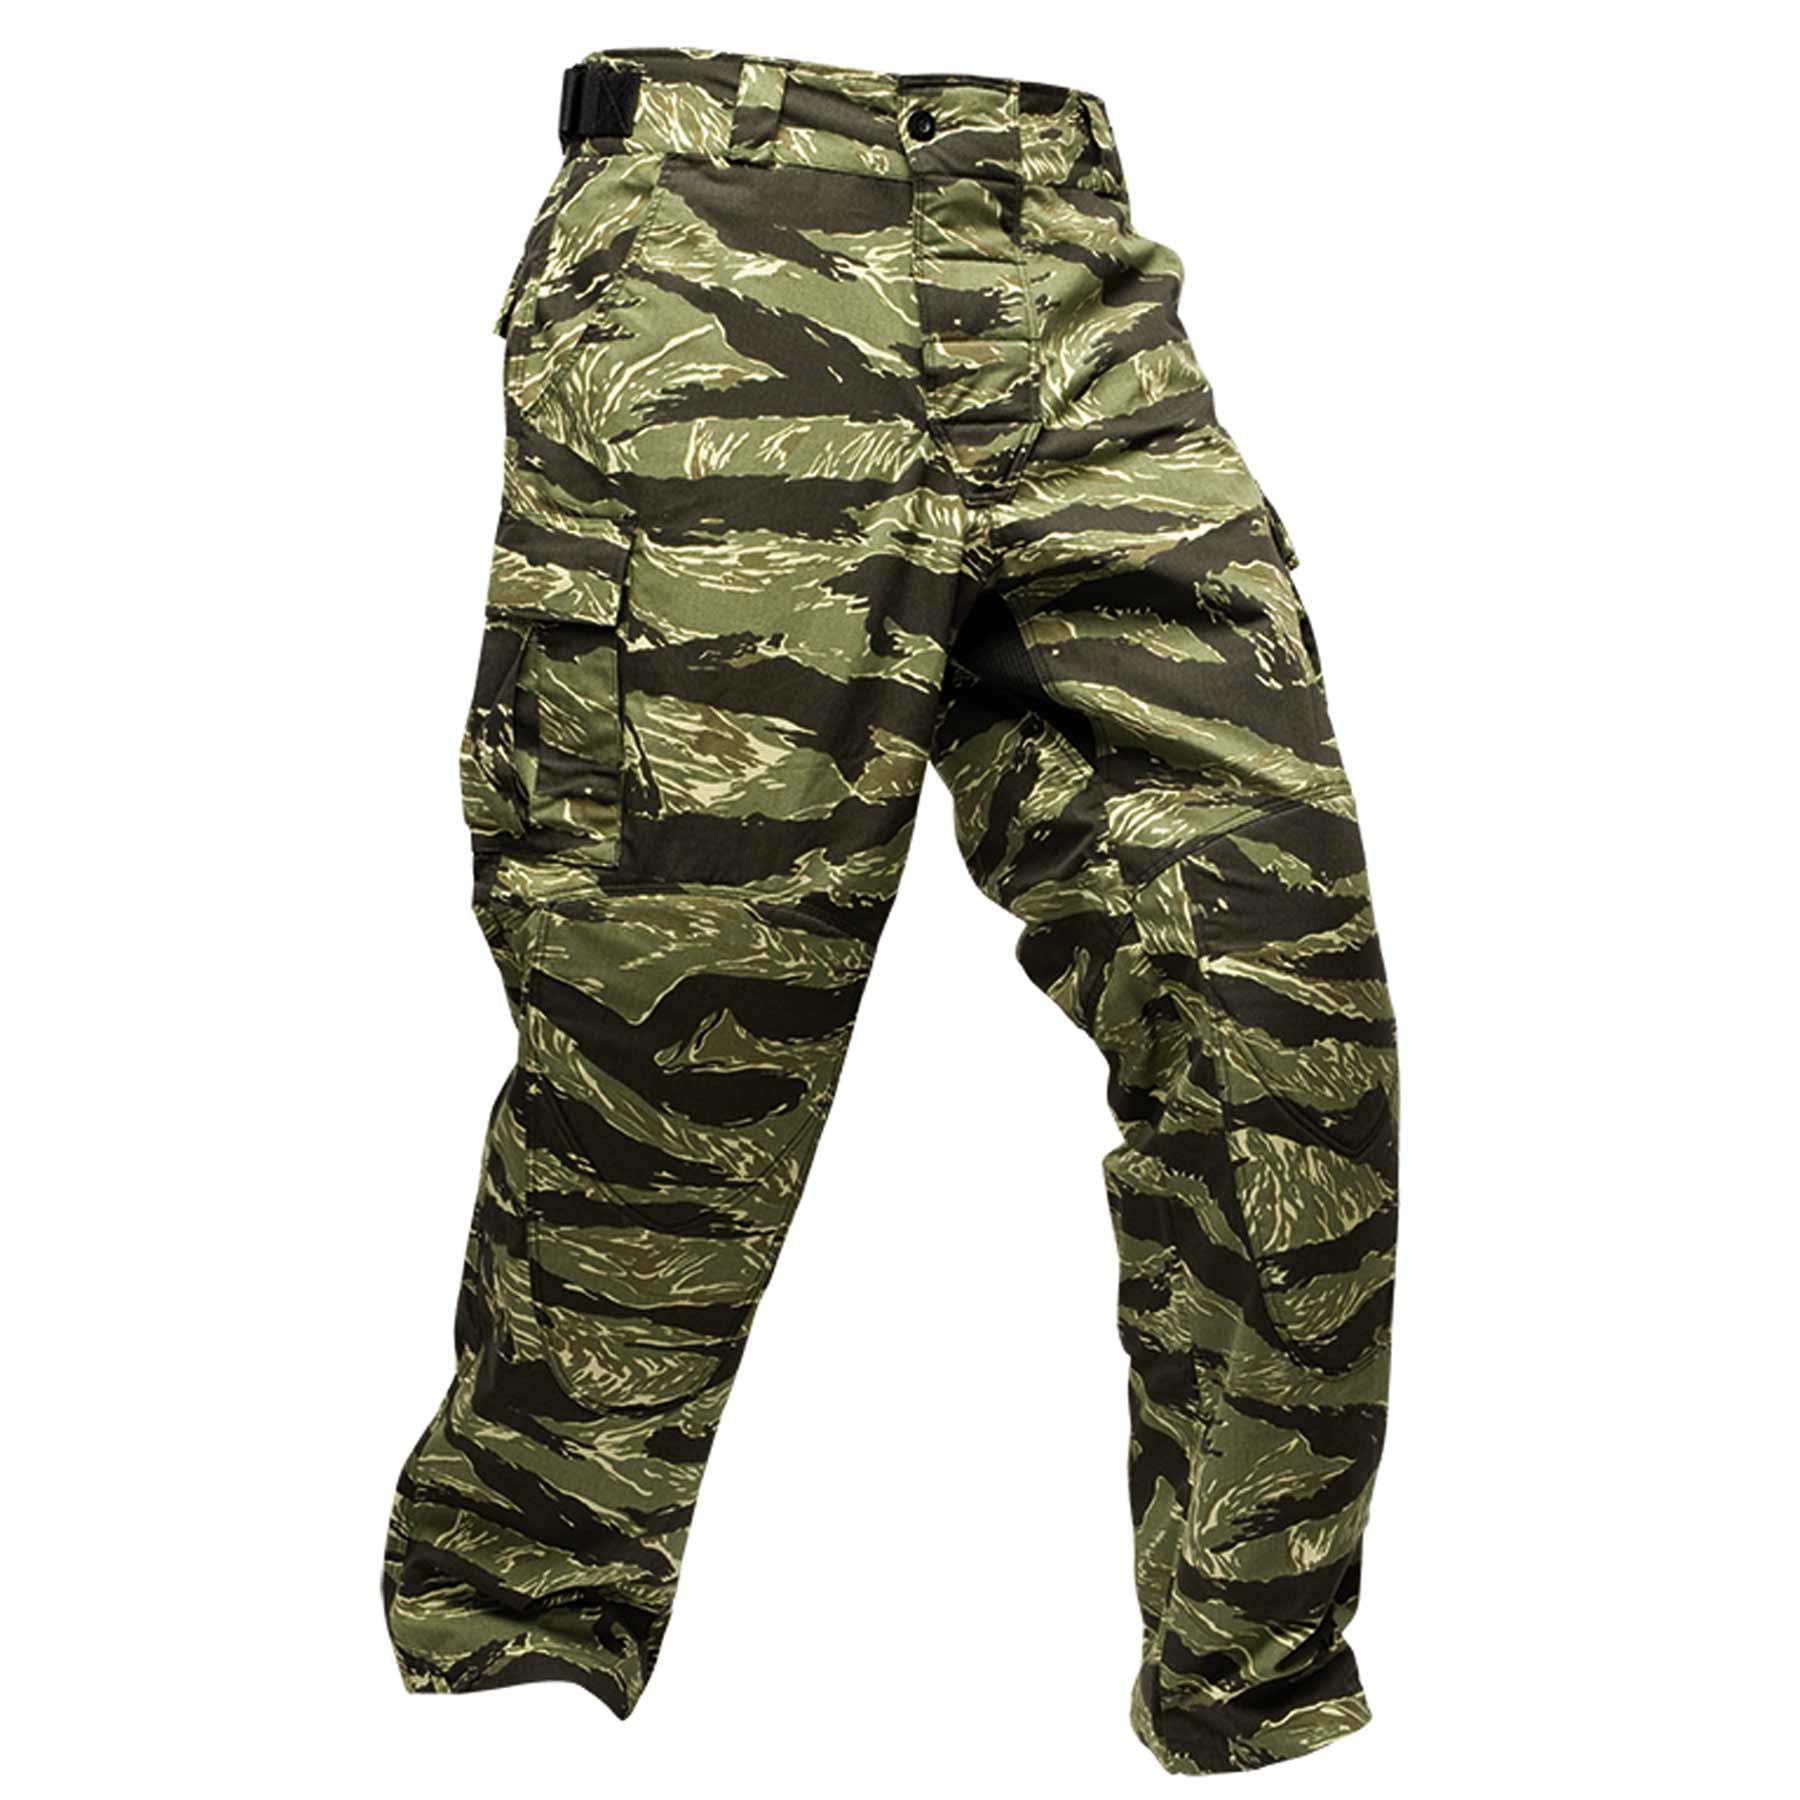 Valken Tactical Sierra Combat Pants Tiger Stripe a1bfcaef8f9